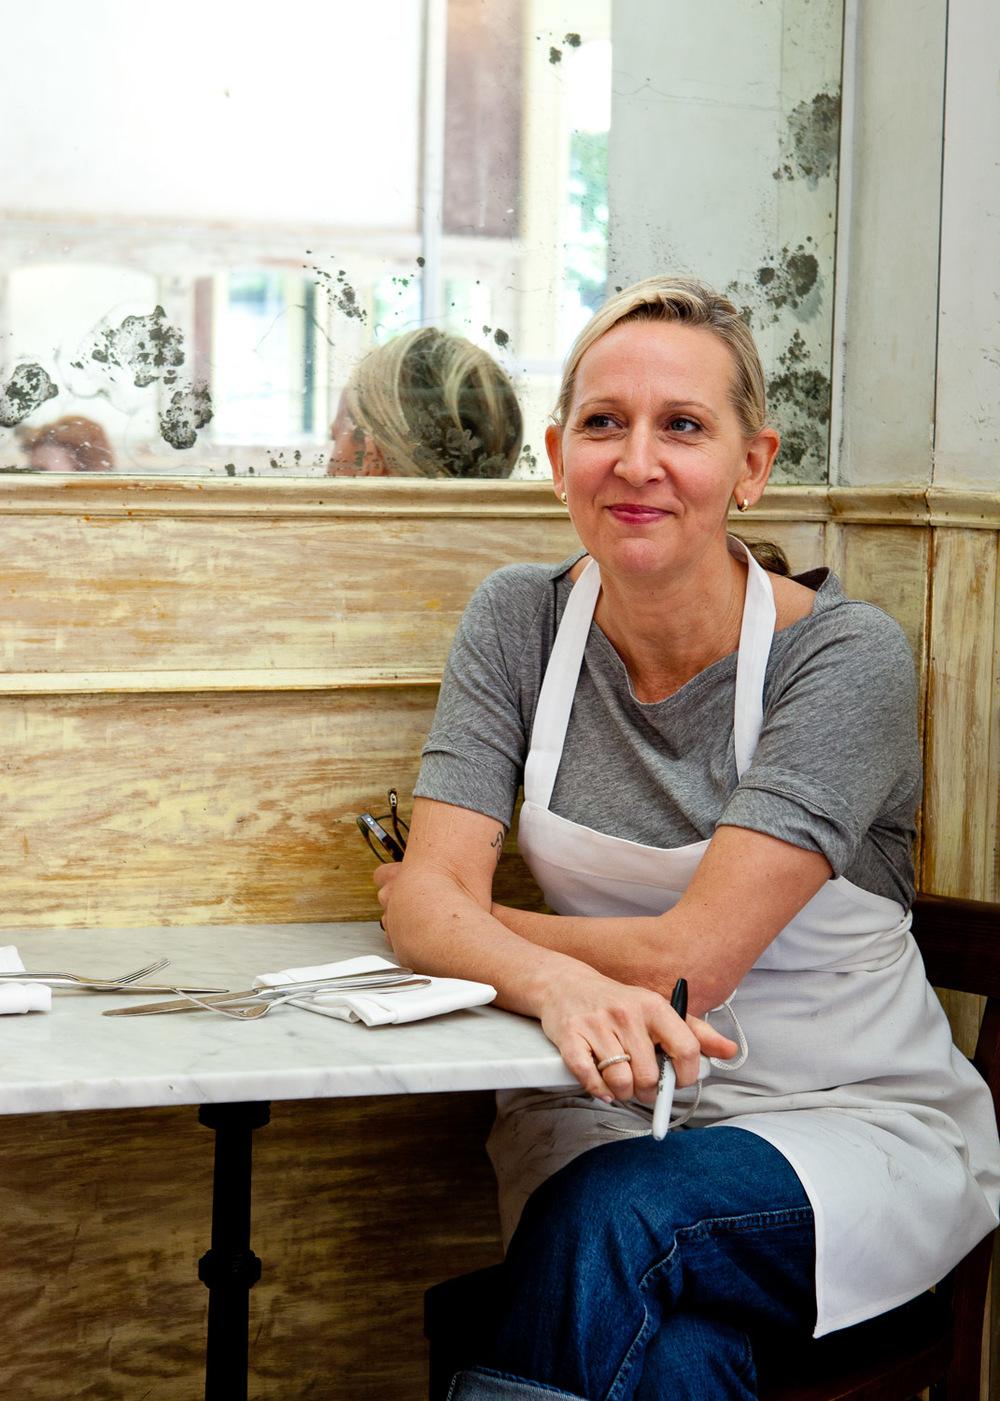 portraits u2014 brent herrig nyc food photographer